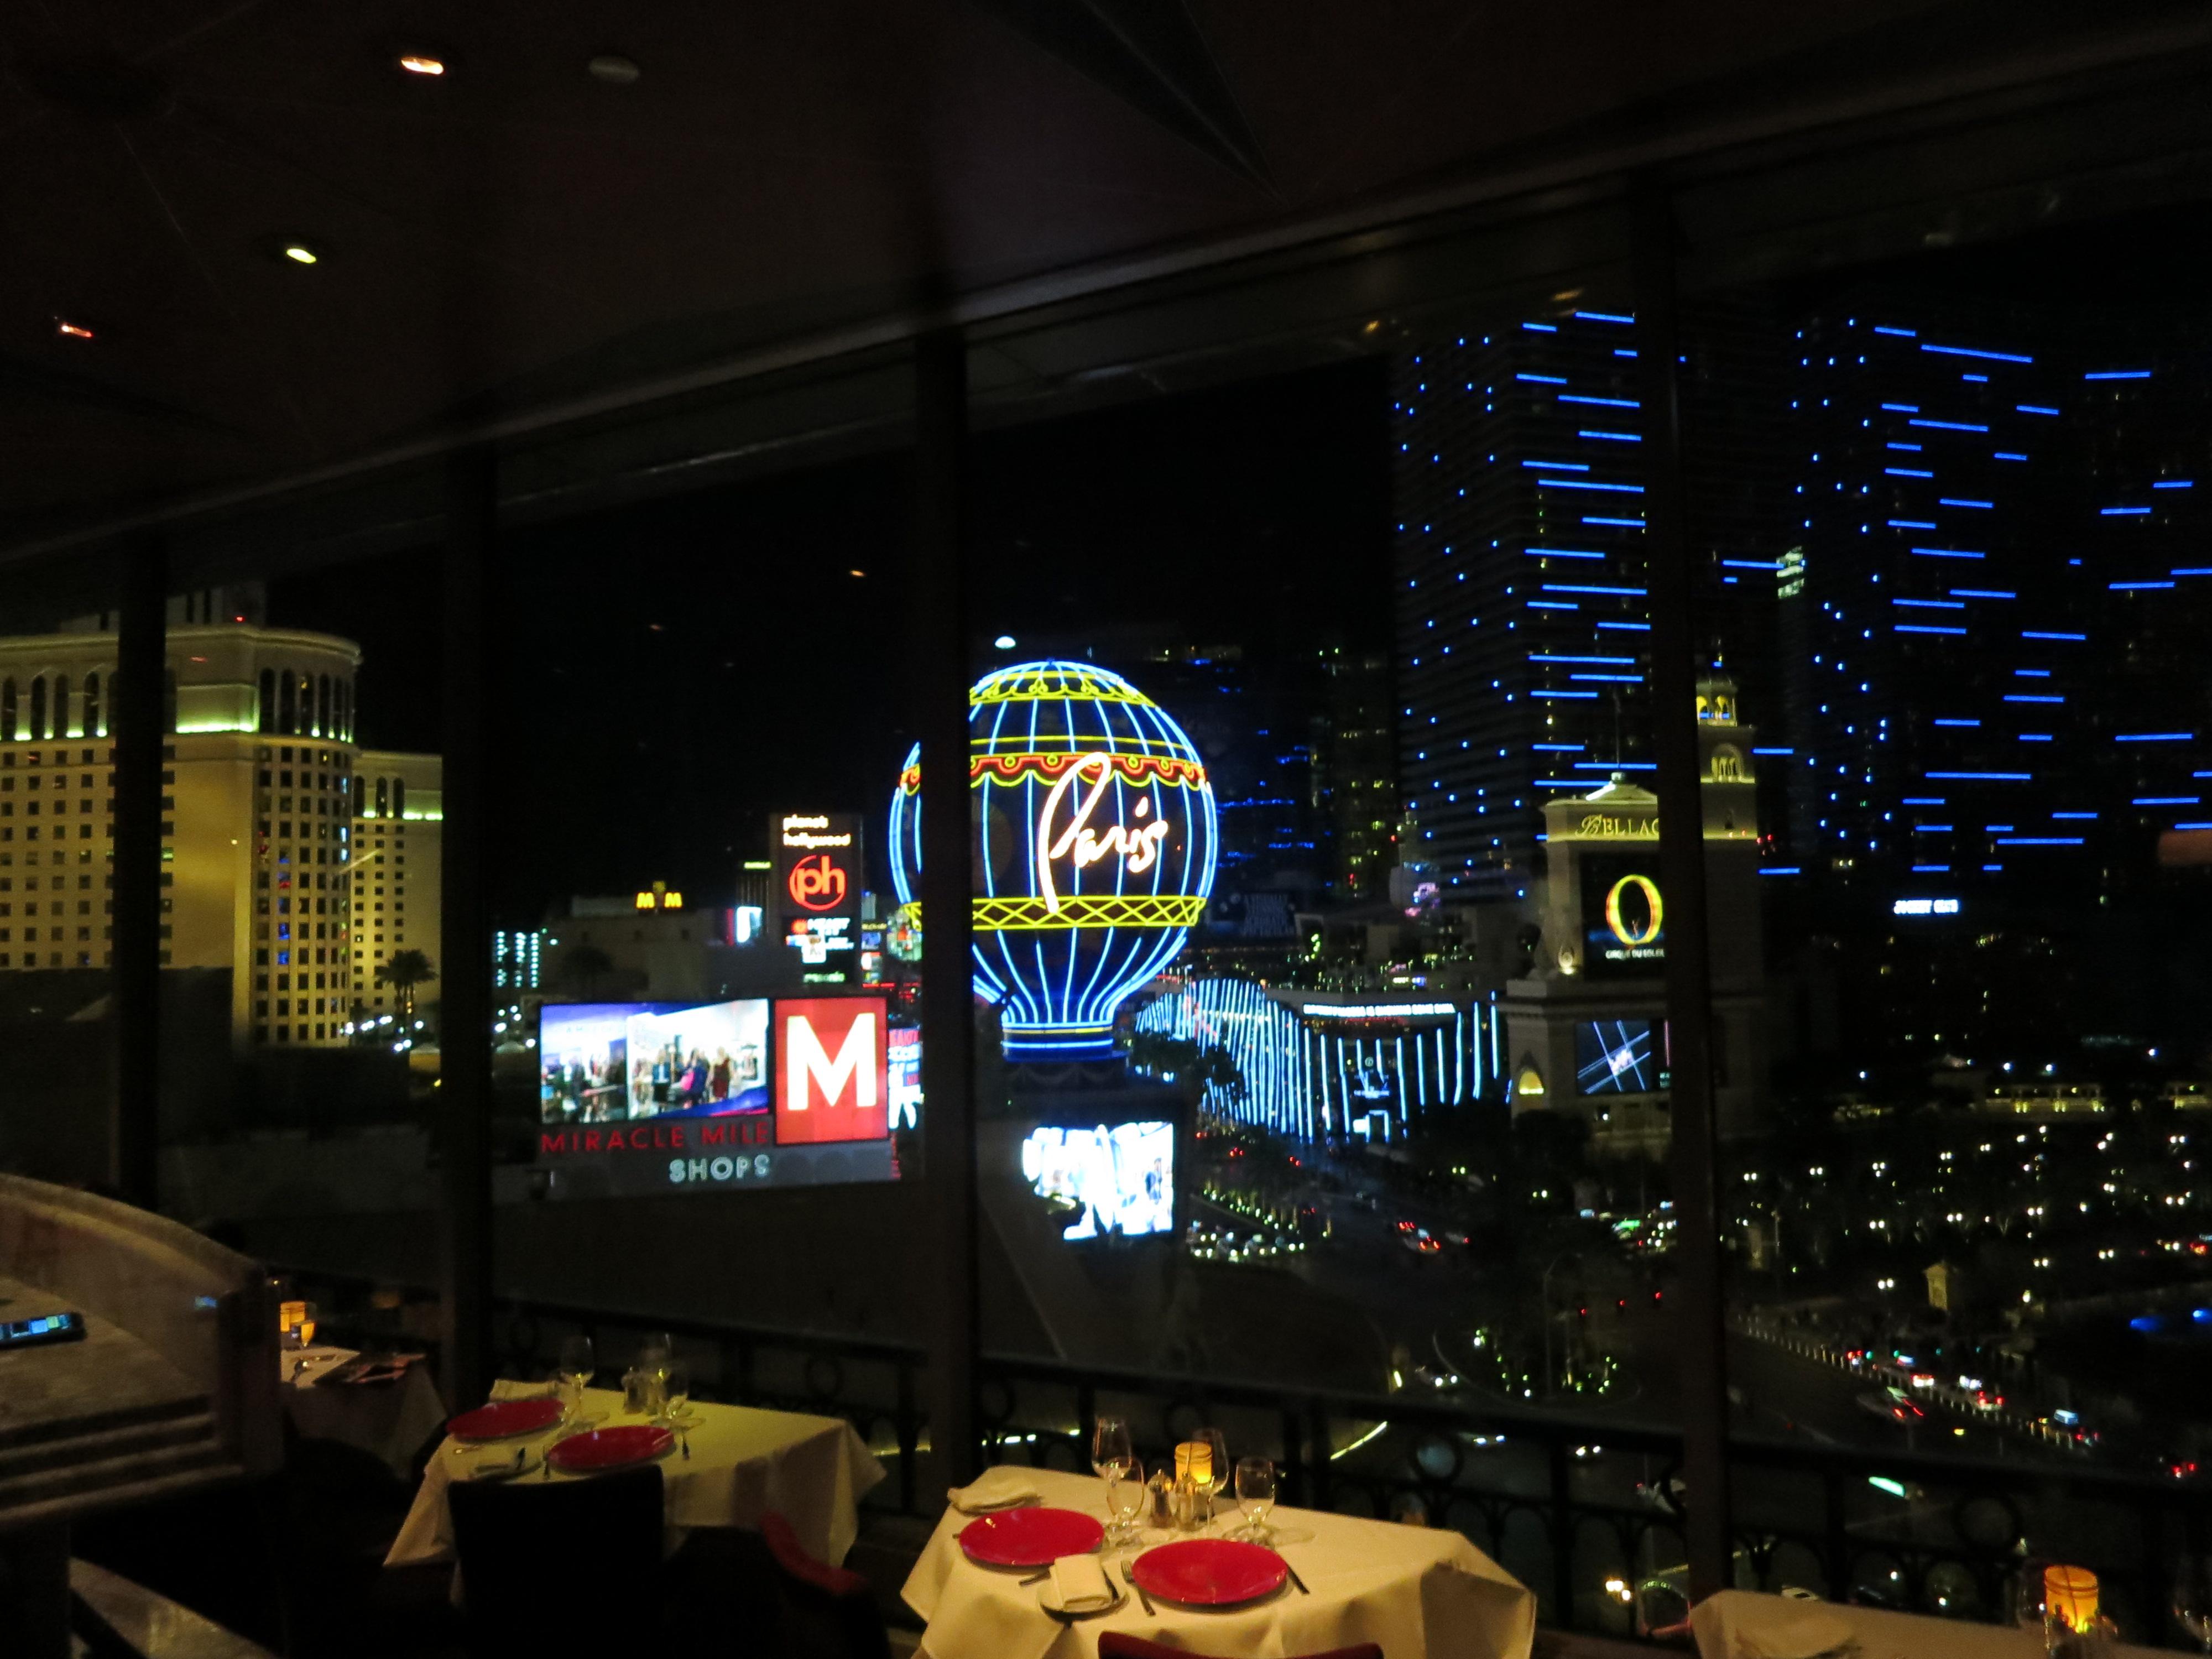 Restaurant At The Paris Hotel Eiffel Tower Paris Las Vegas Dining